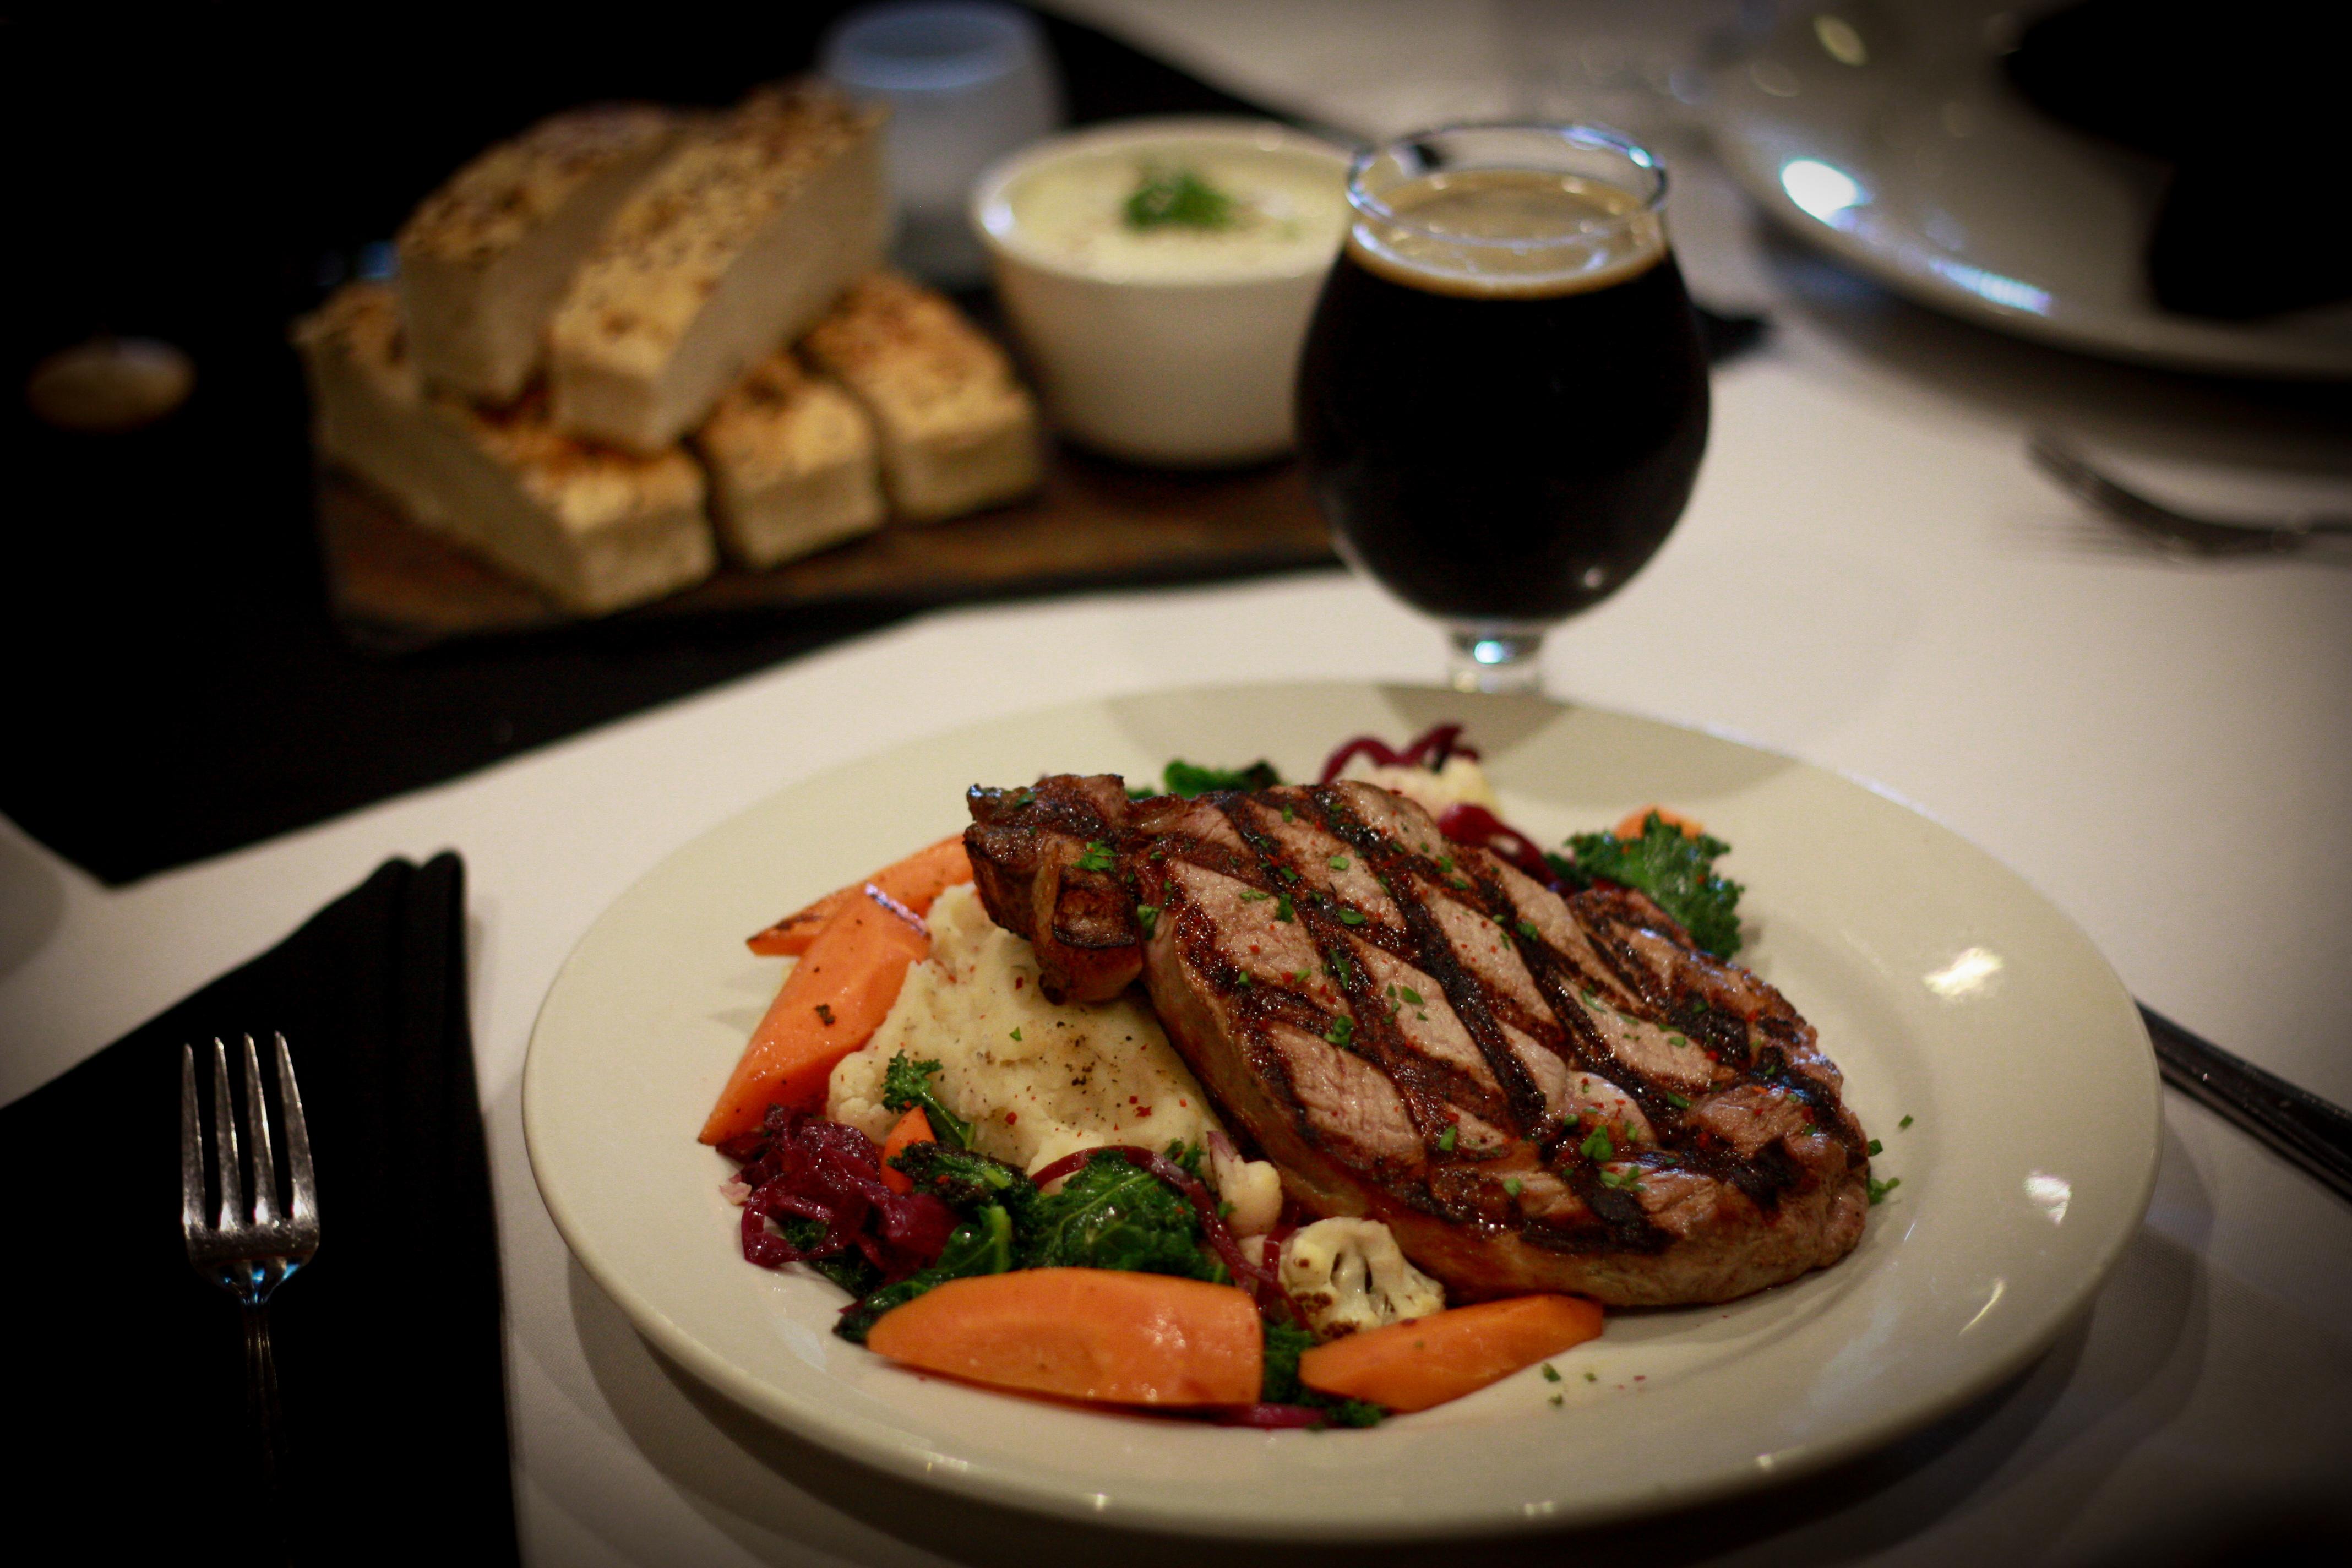 Aged Black Angus Beef Steak